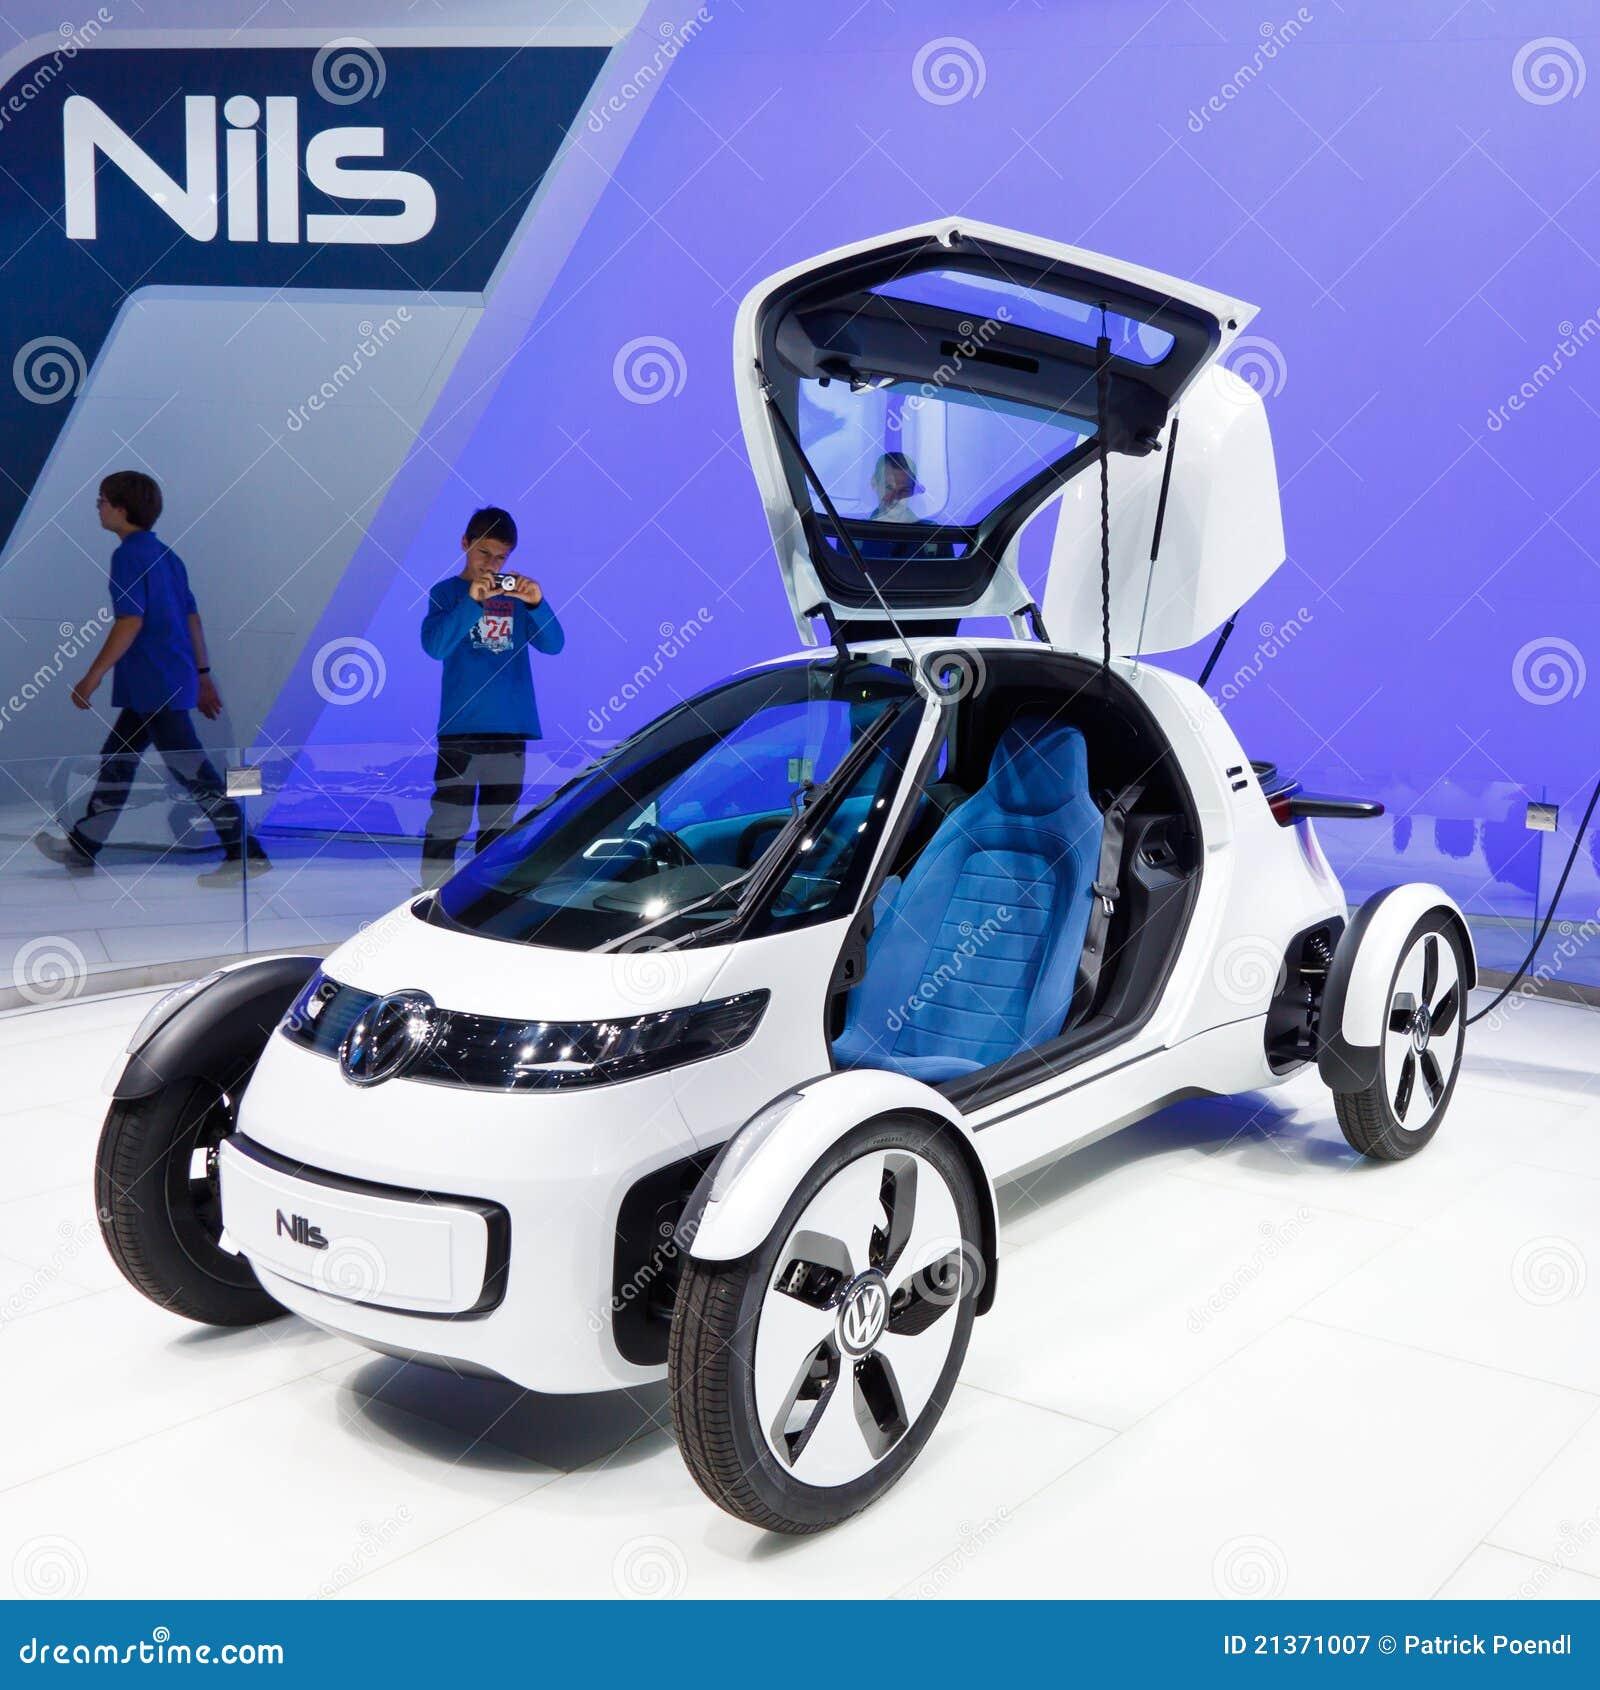 Volkswagen Nils Concept Car Editorial Photography